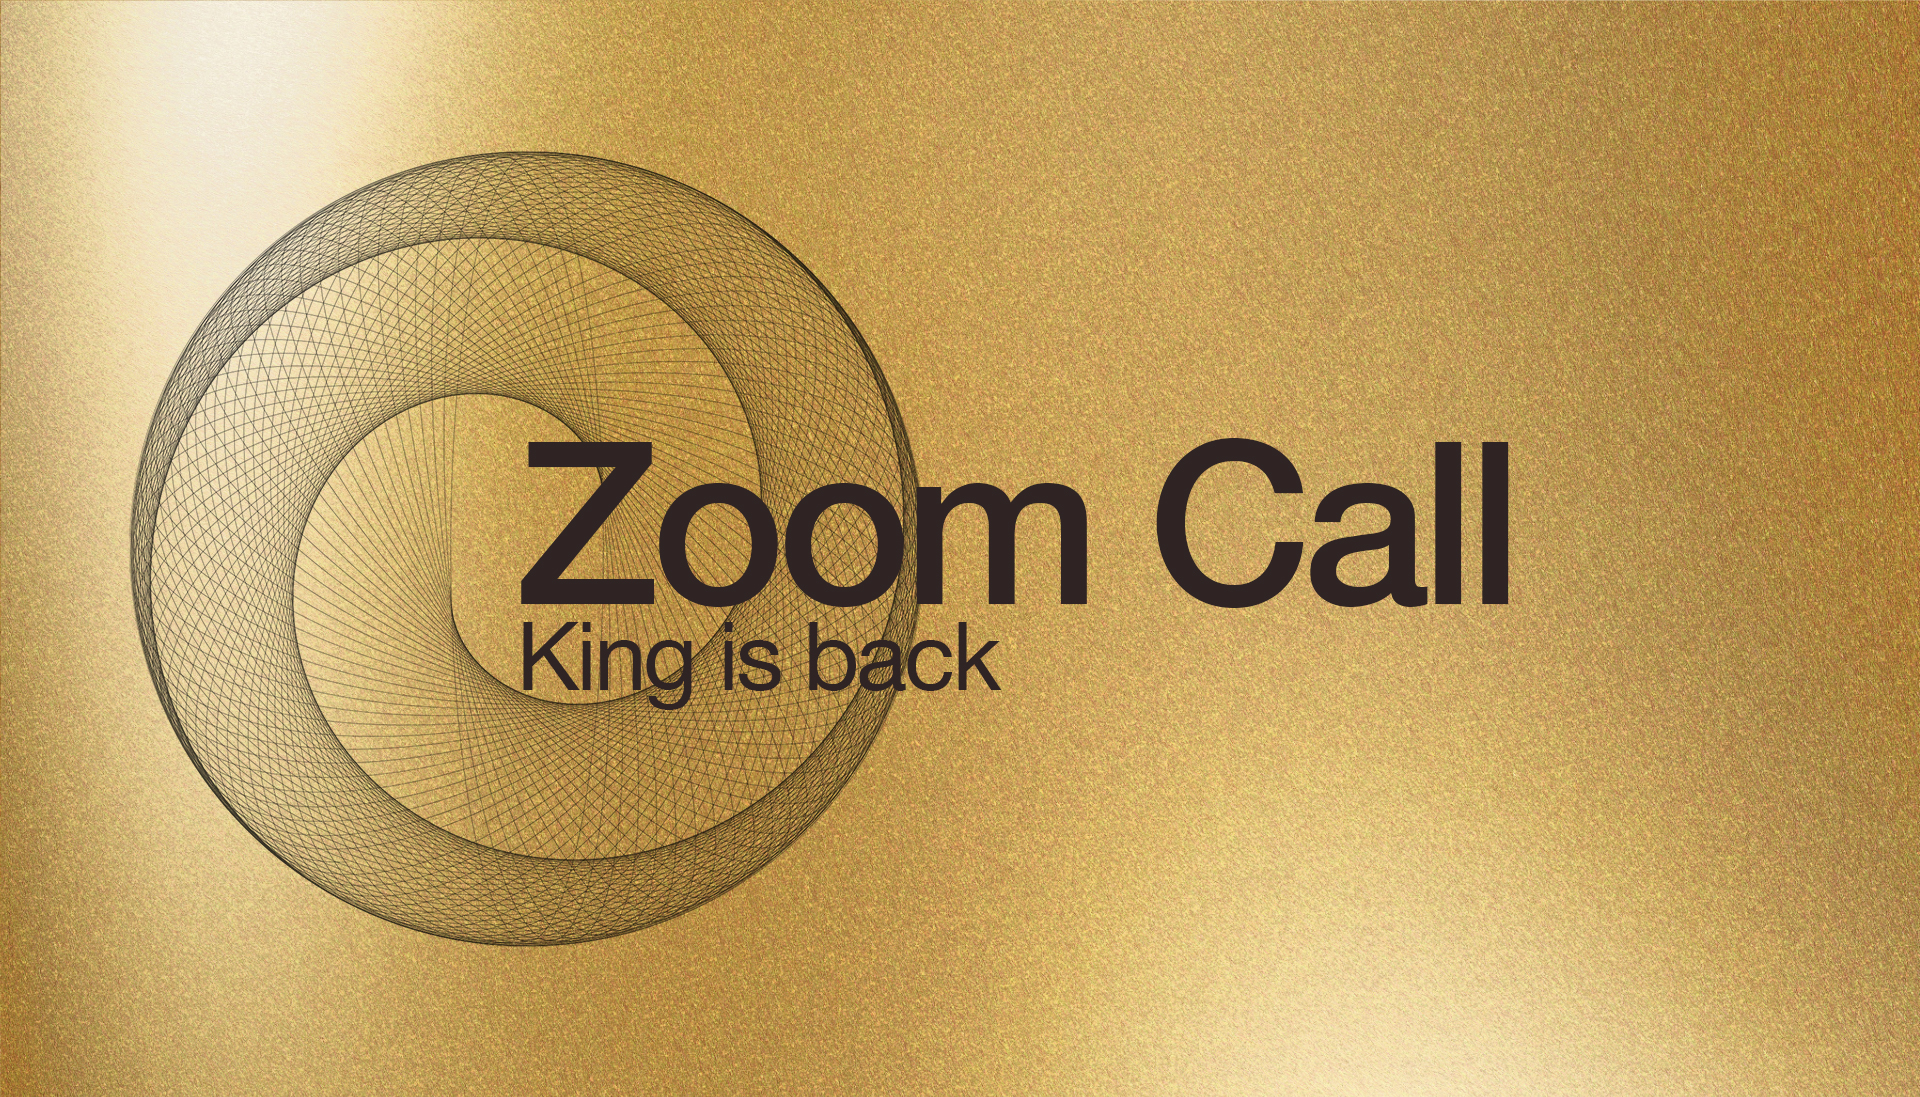 kingisback-16-9-zoom-call